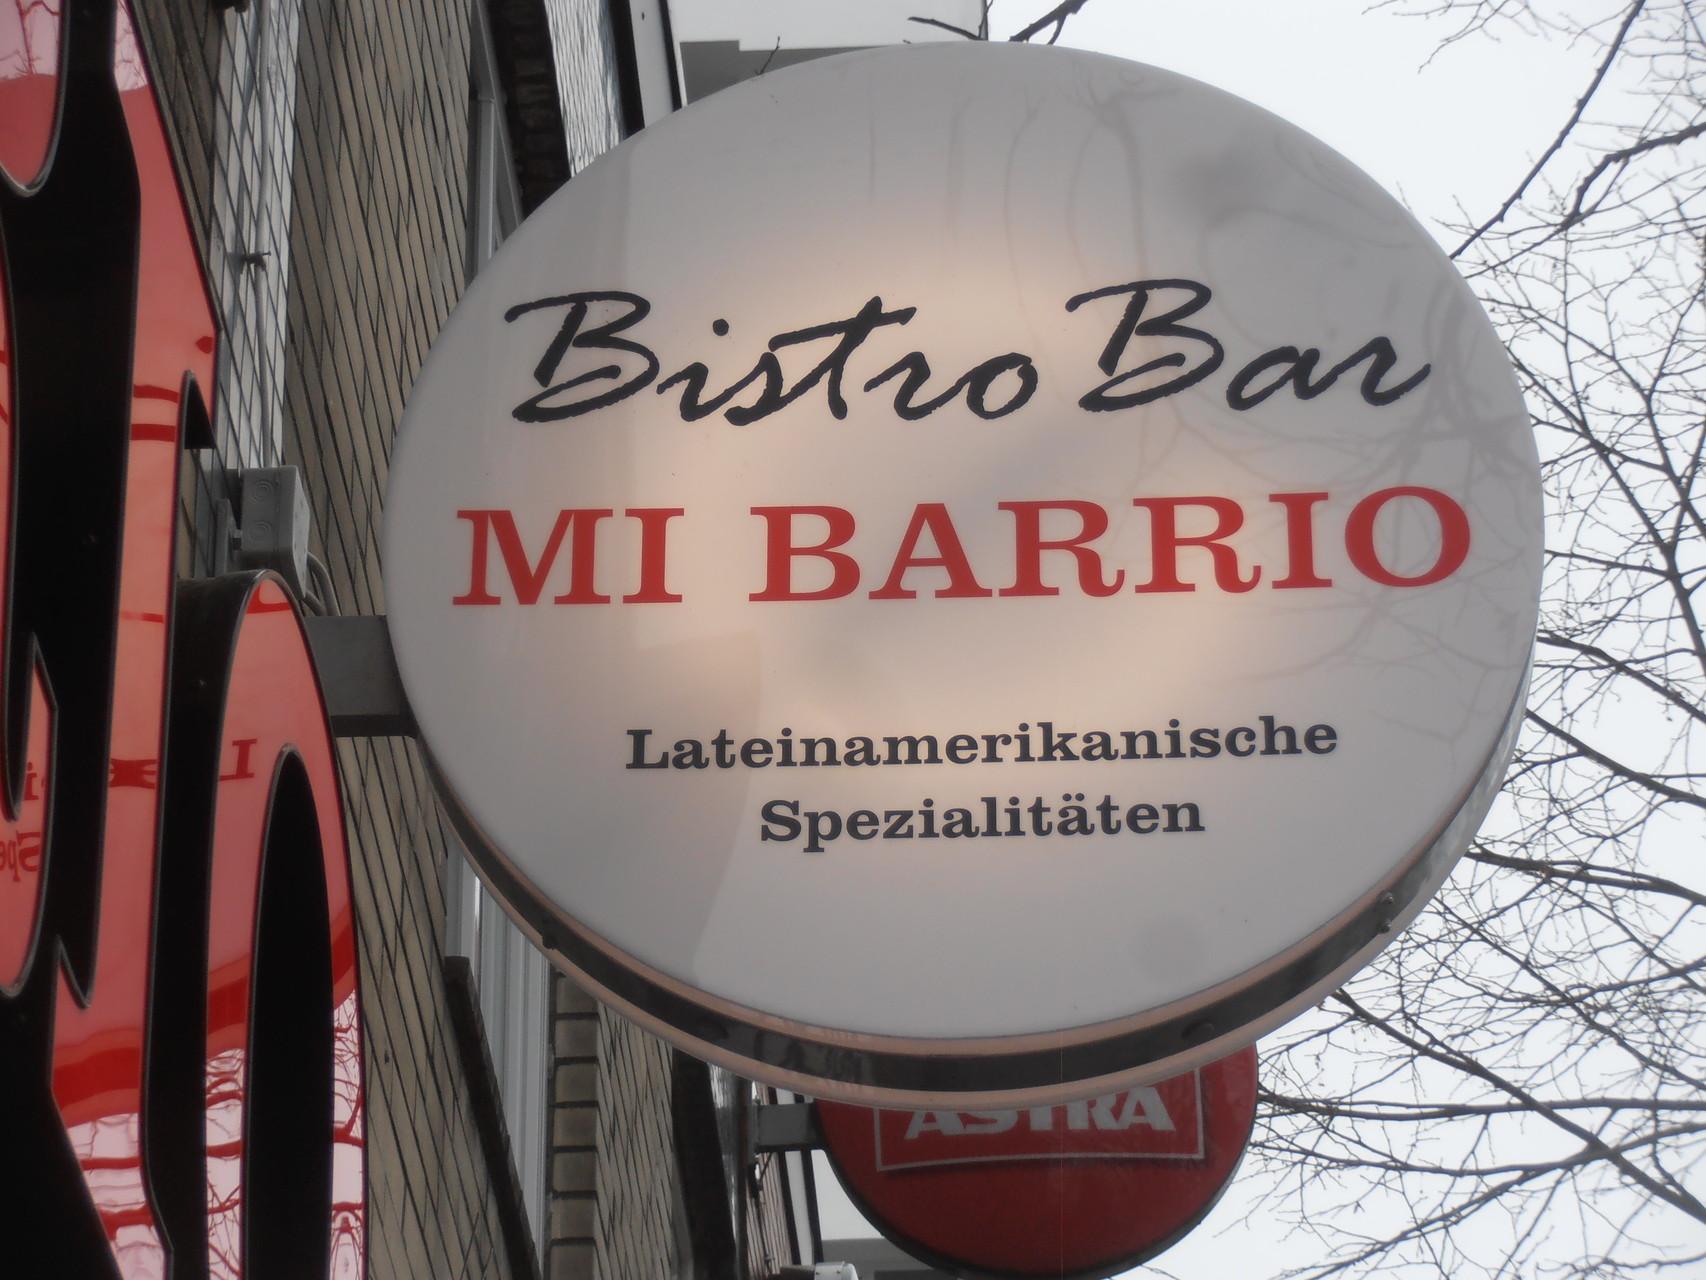 Ehemalige - Bistro Bar - MI BARRIO - Lateinamerikanische Spezialitäten - Reeperbahn 153 Hamburg St. Pauli